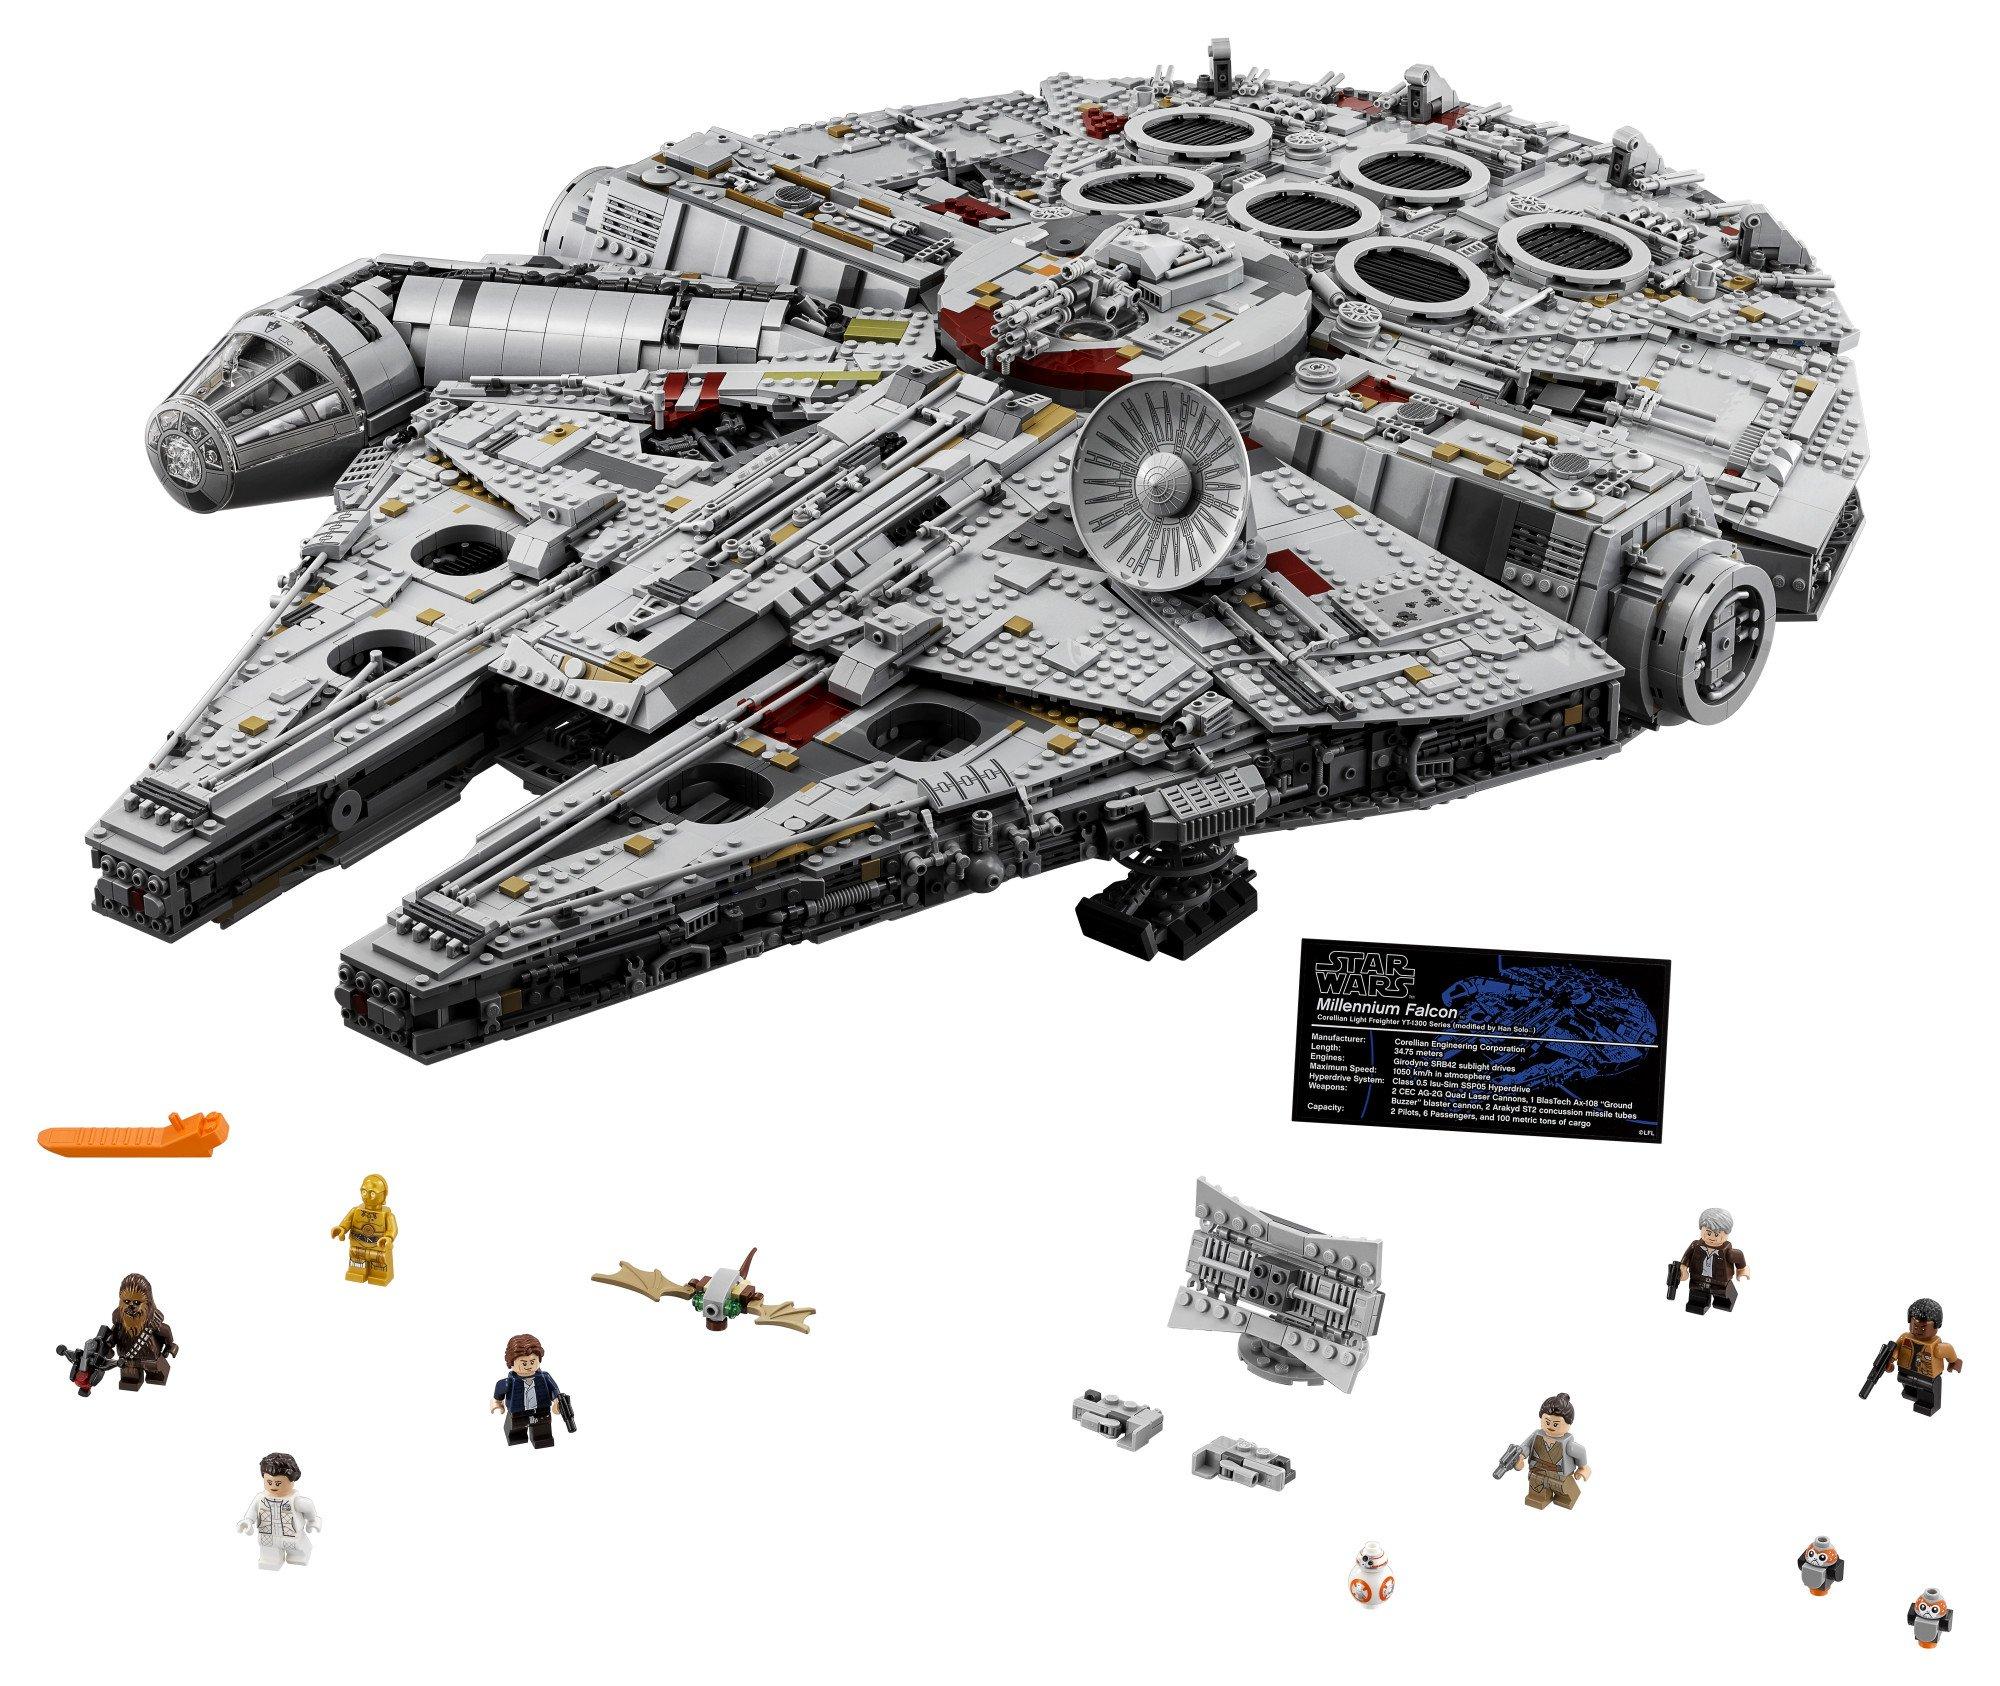 LEGO Star Wars Millennium Falcon 75192 Building Kit (7541 Piece) by LEGO (Image #1)